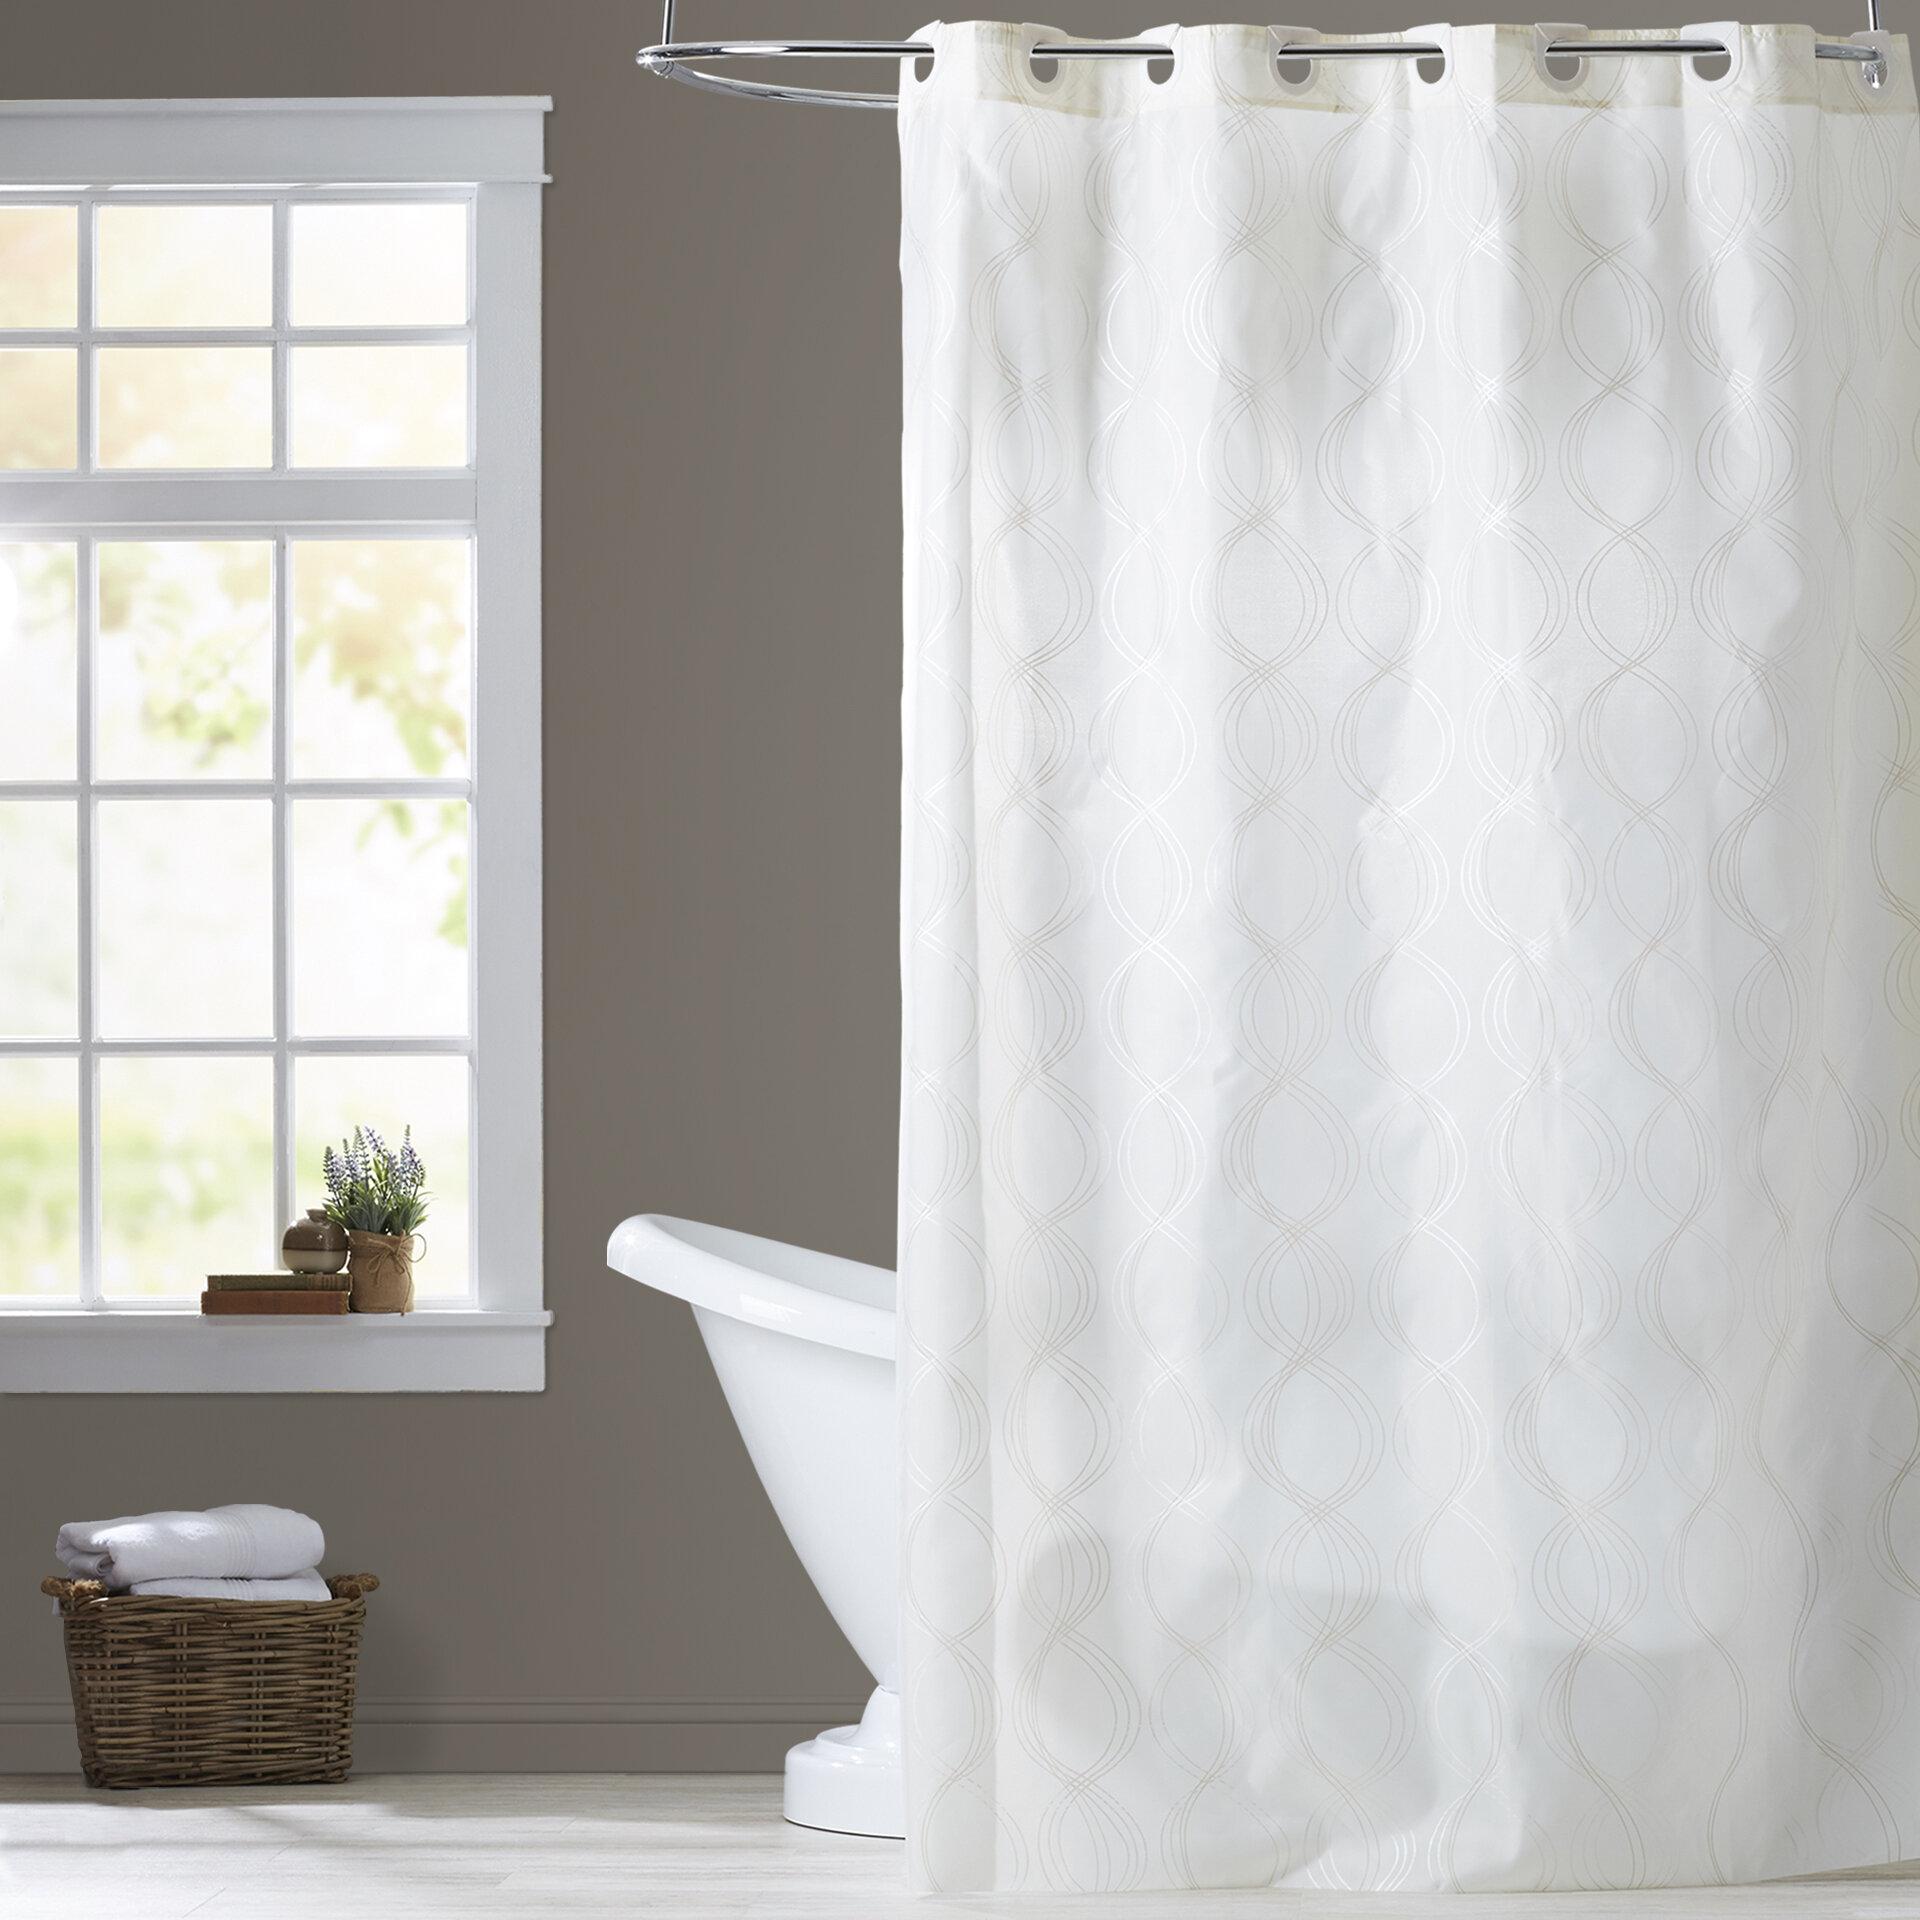 Birch LaneTM Ivory Shower Curtain Reviews